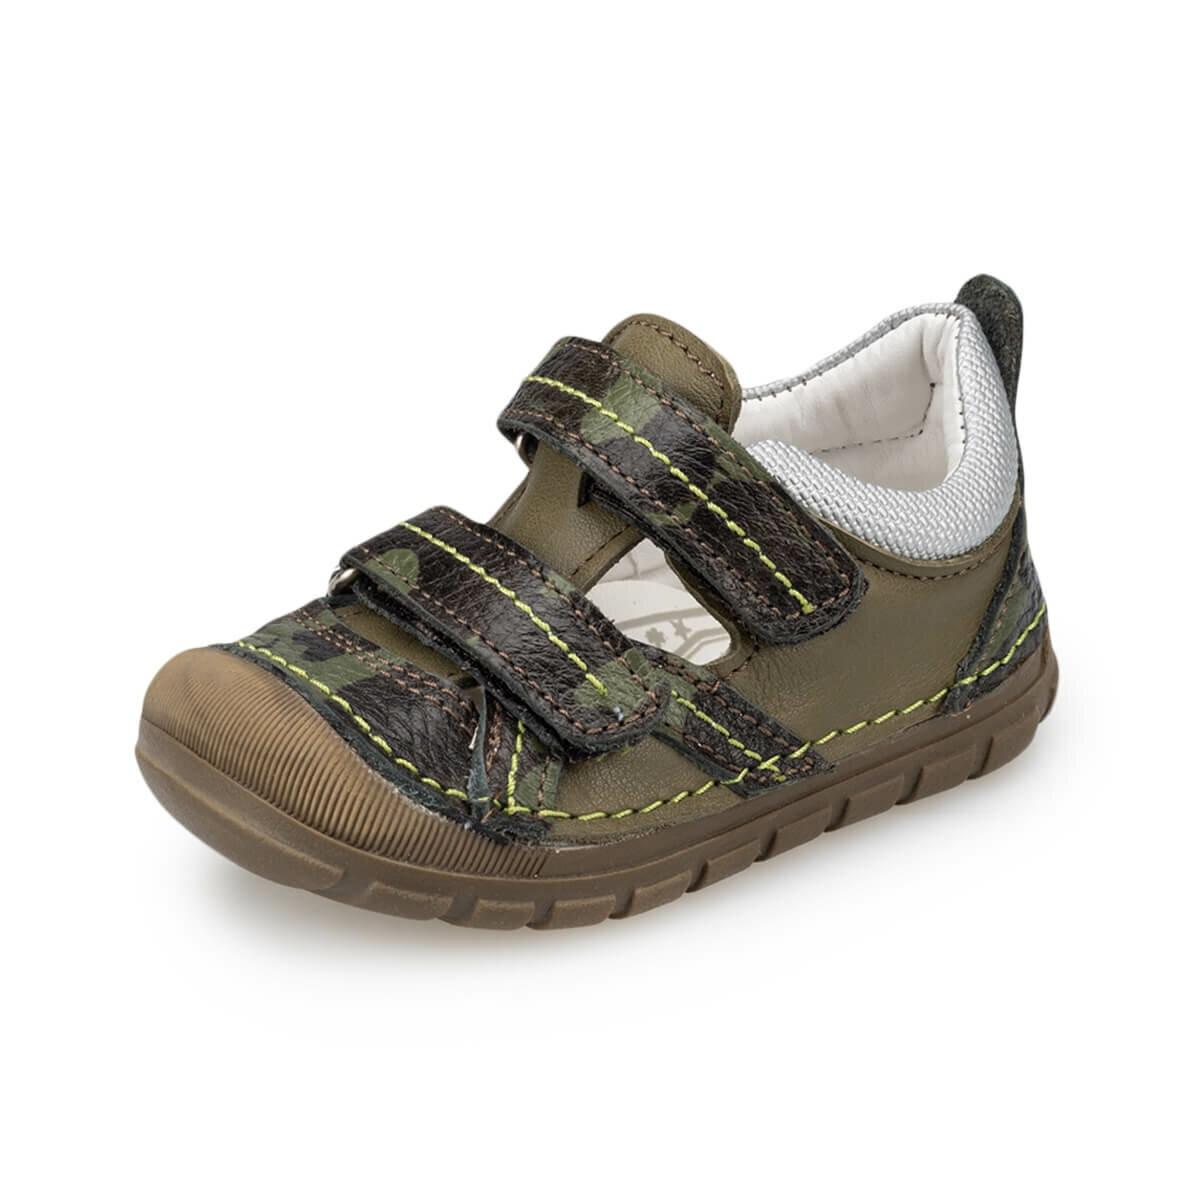 FLO 91.511394.I Green Male Child Sports Shoes Polaris